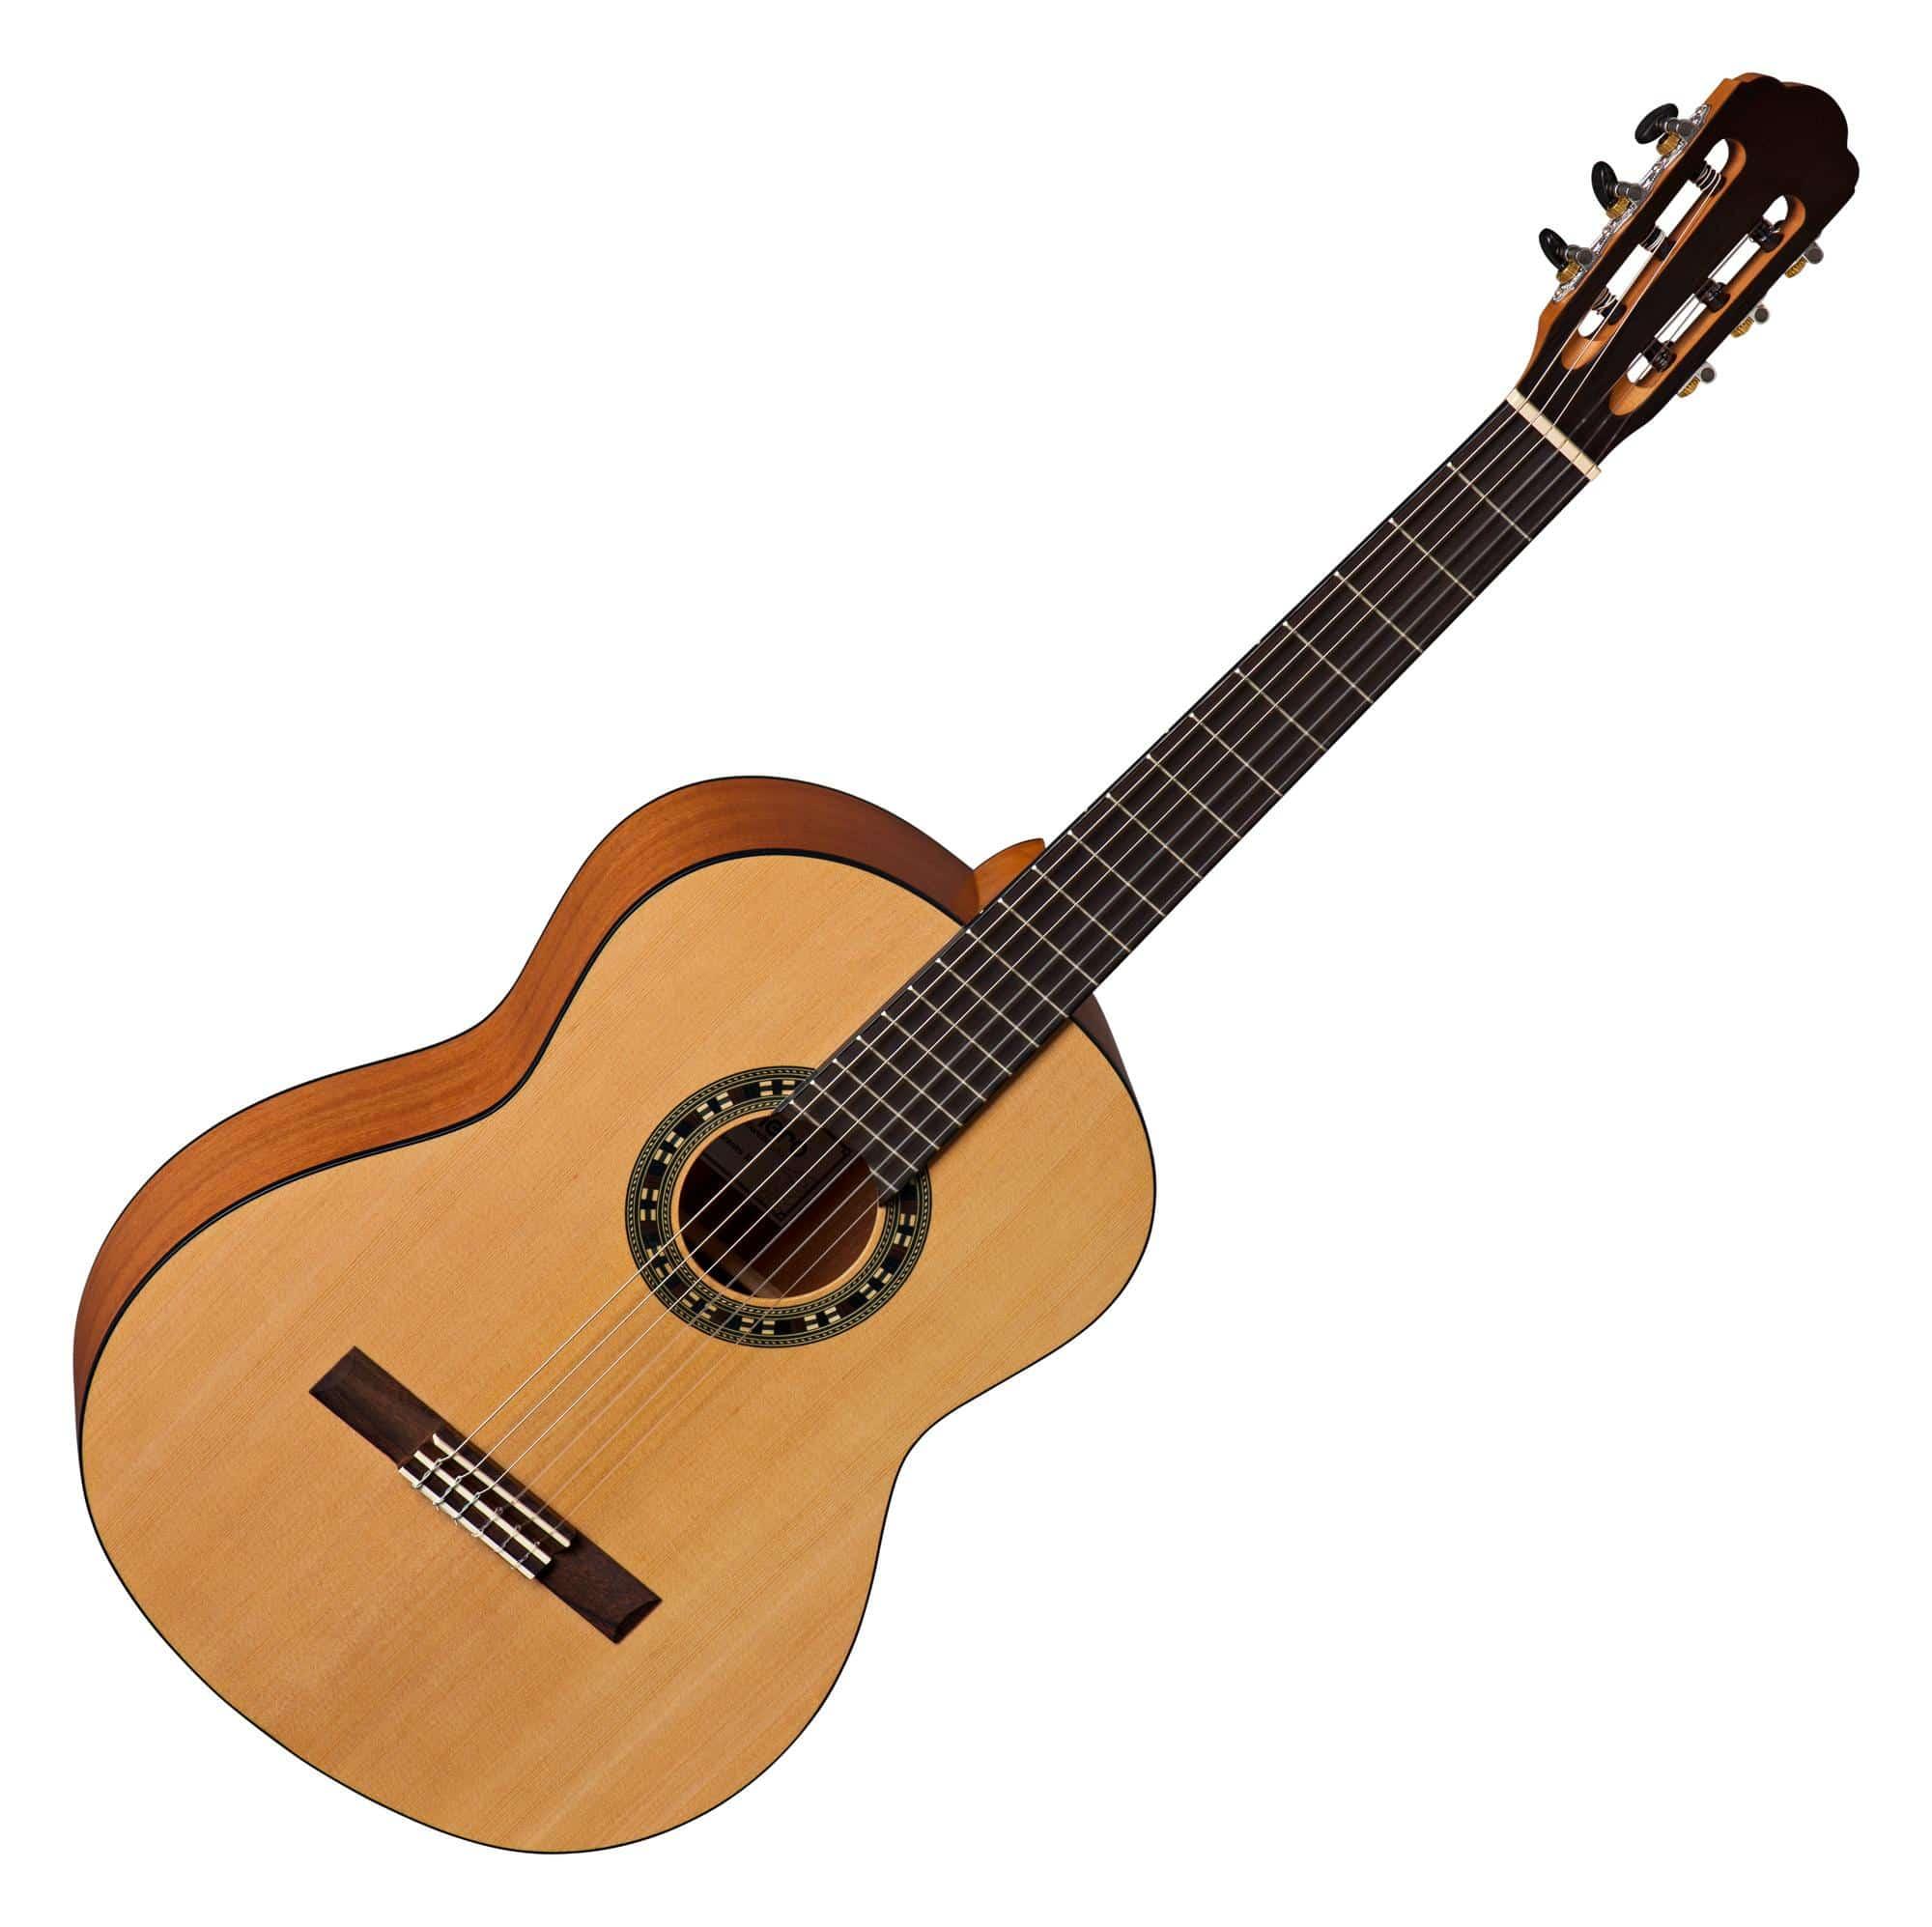 Romero by La Mancha Granito 32 3|4 Konzertgitarre